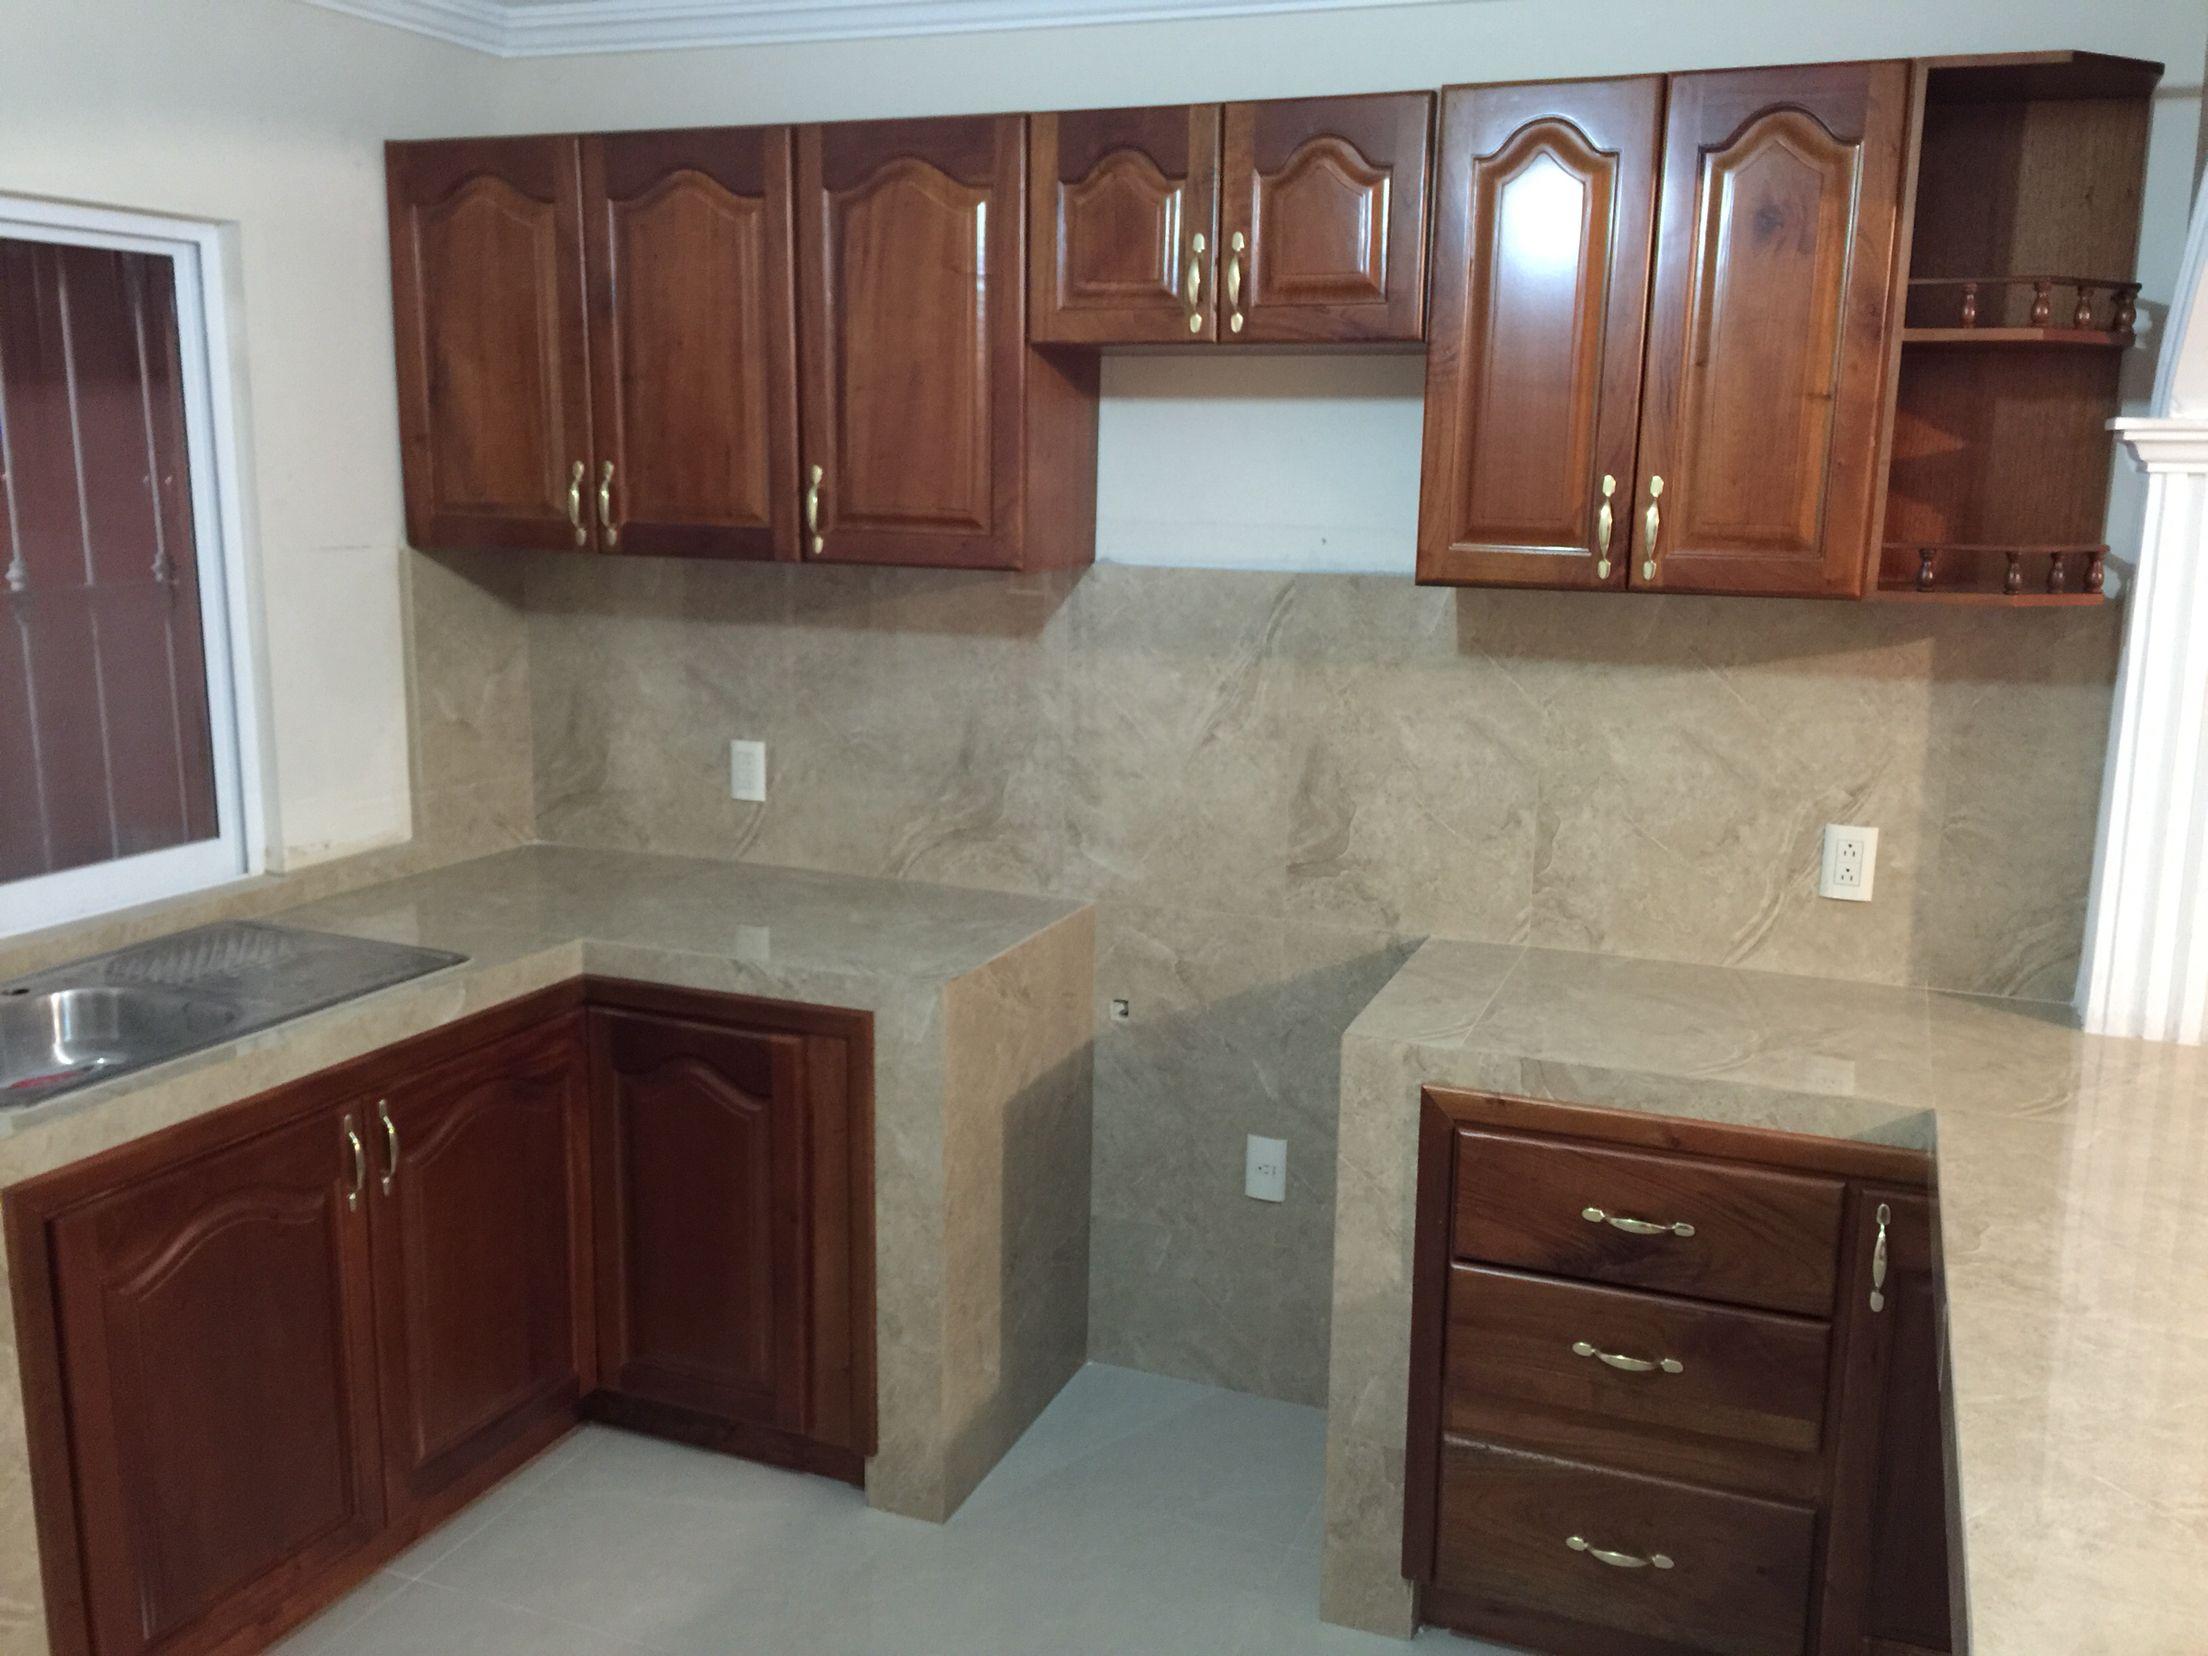 Cocina integral en madera de cedro con puertas estilo - Cocinas de madera modernas ...